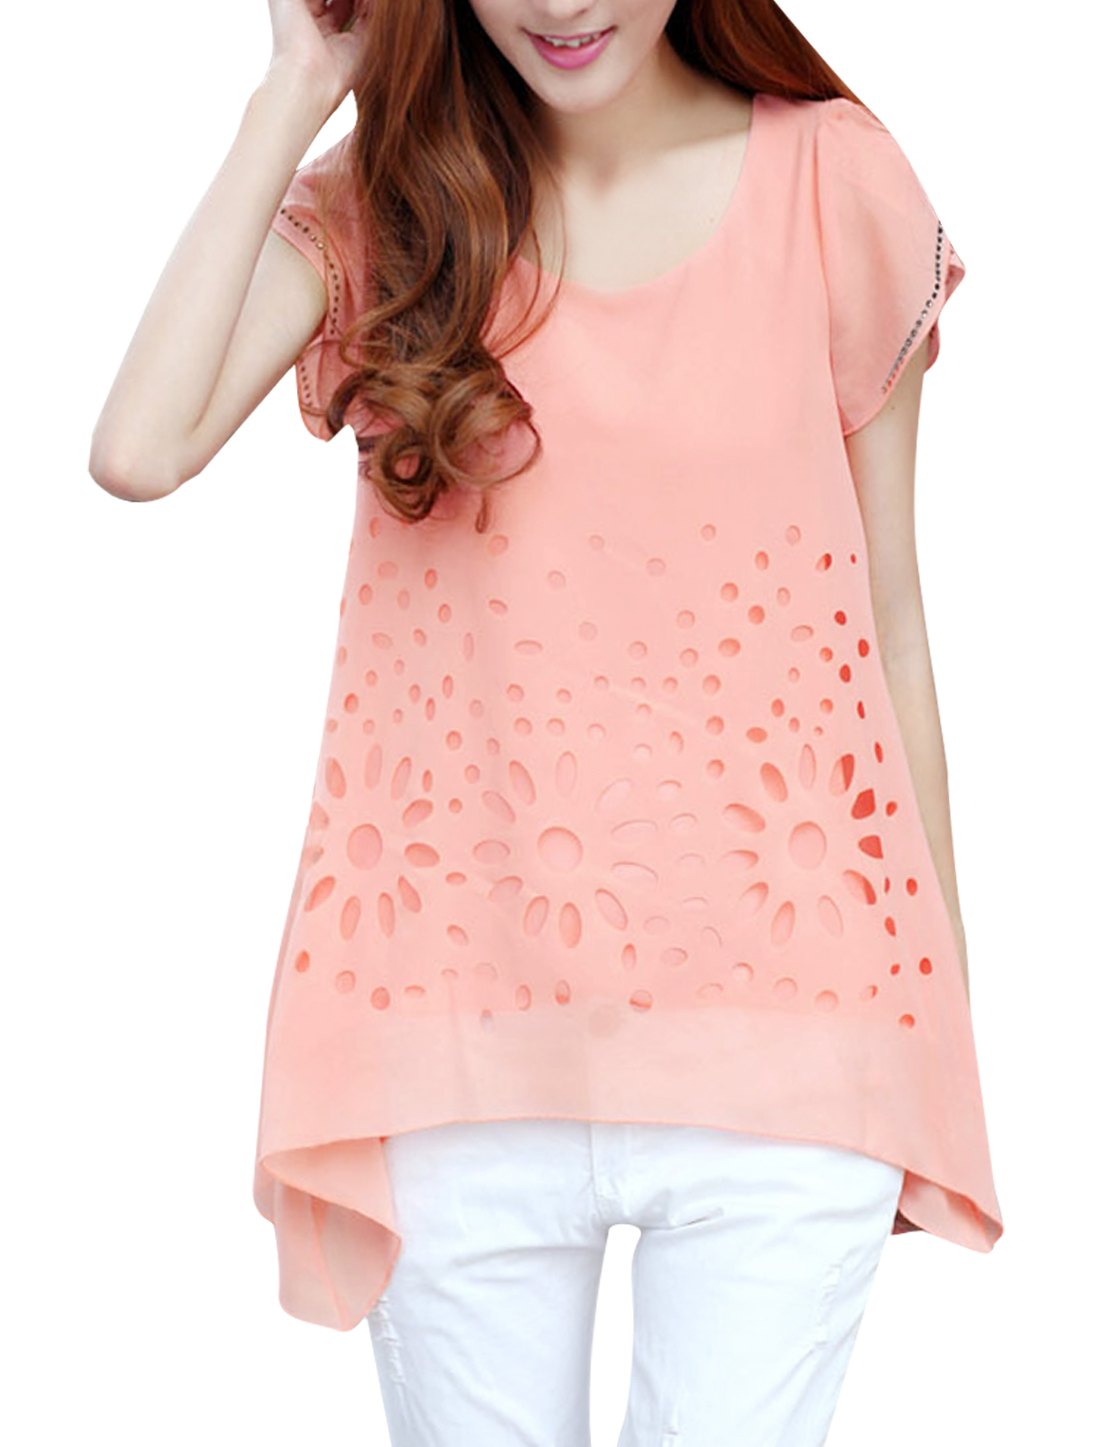 Ladies Round Neck Pullover Cap Sleeve Rhinestone Decor Top Shirt Pink S